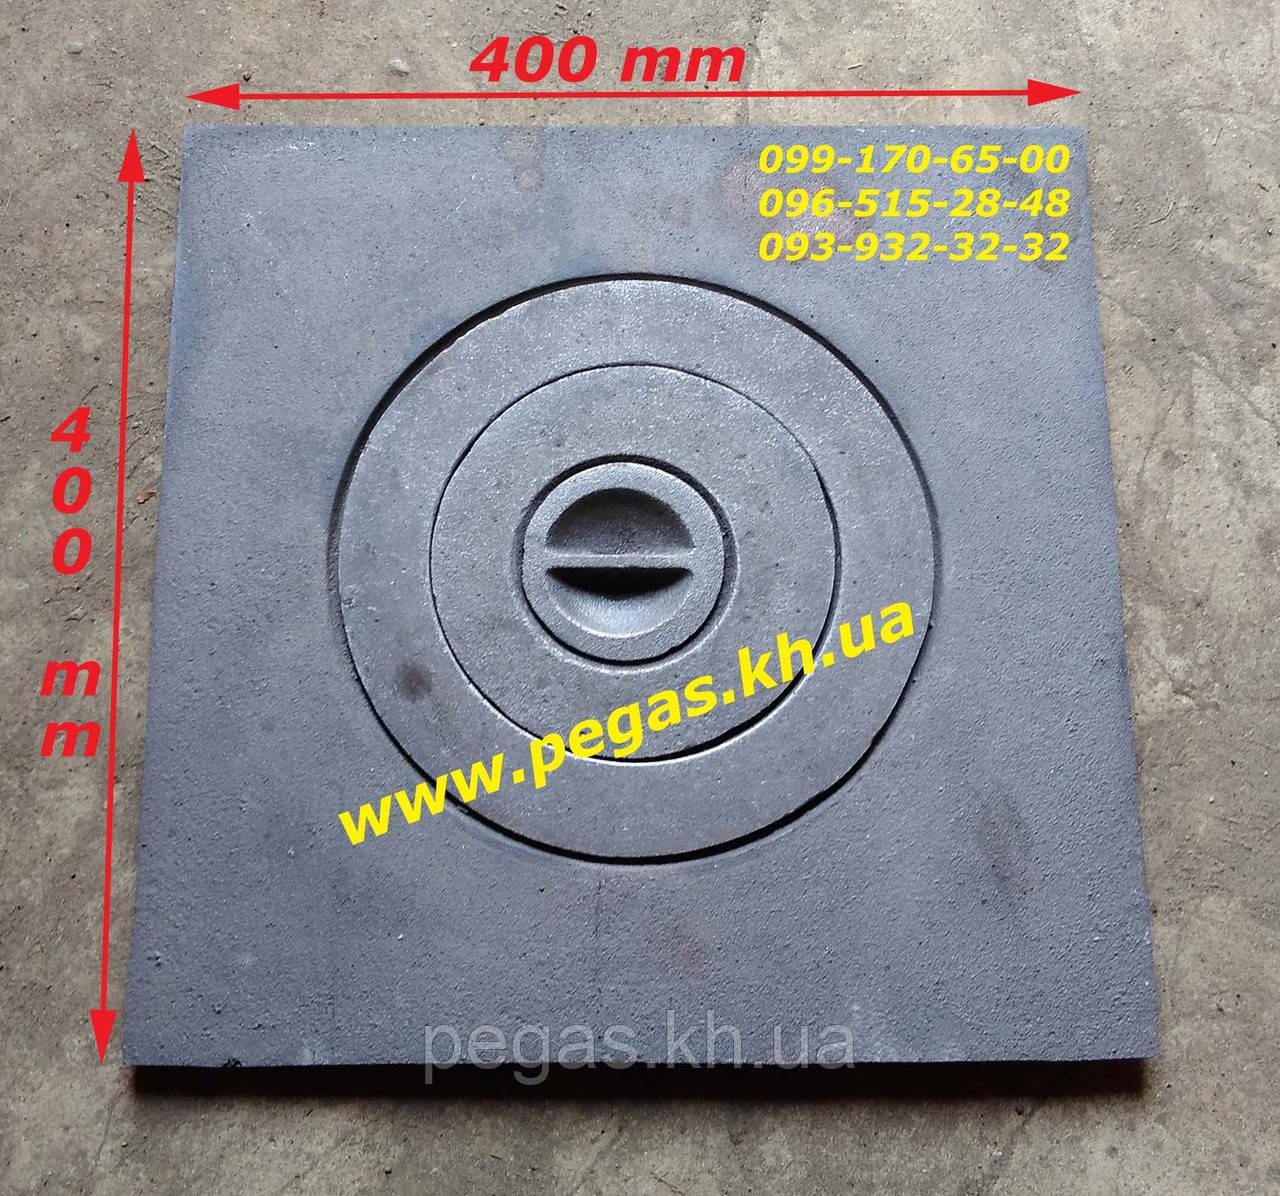 Плита чугунная печная 400х400 мм. мангал, печи, грубу, котлы